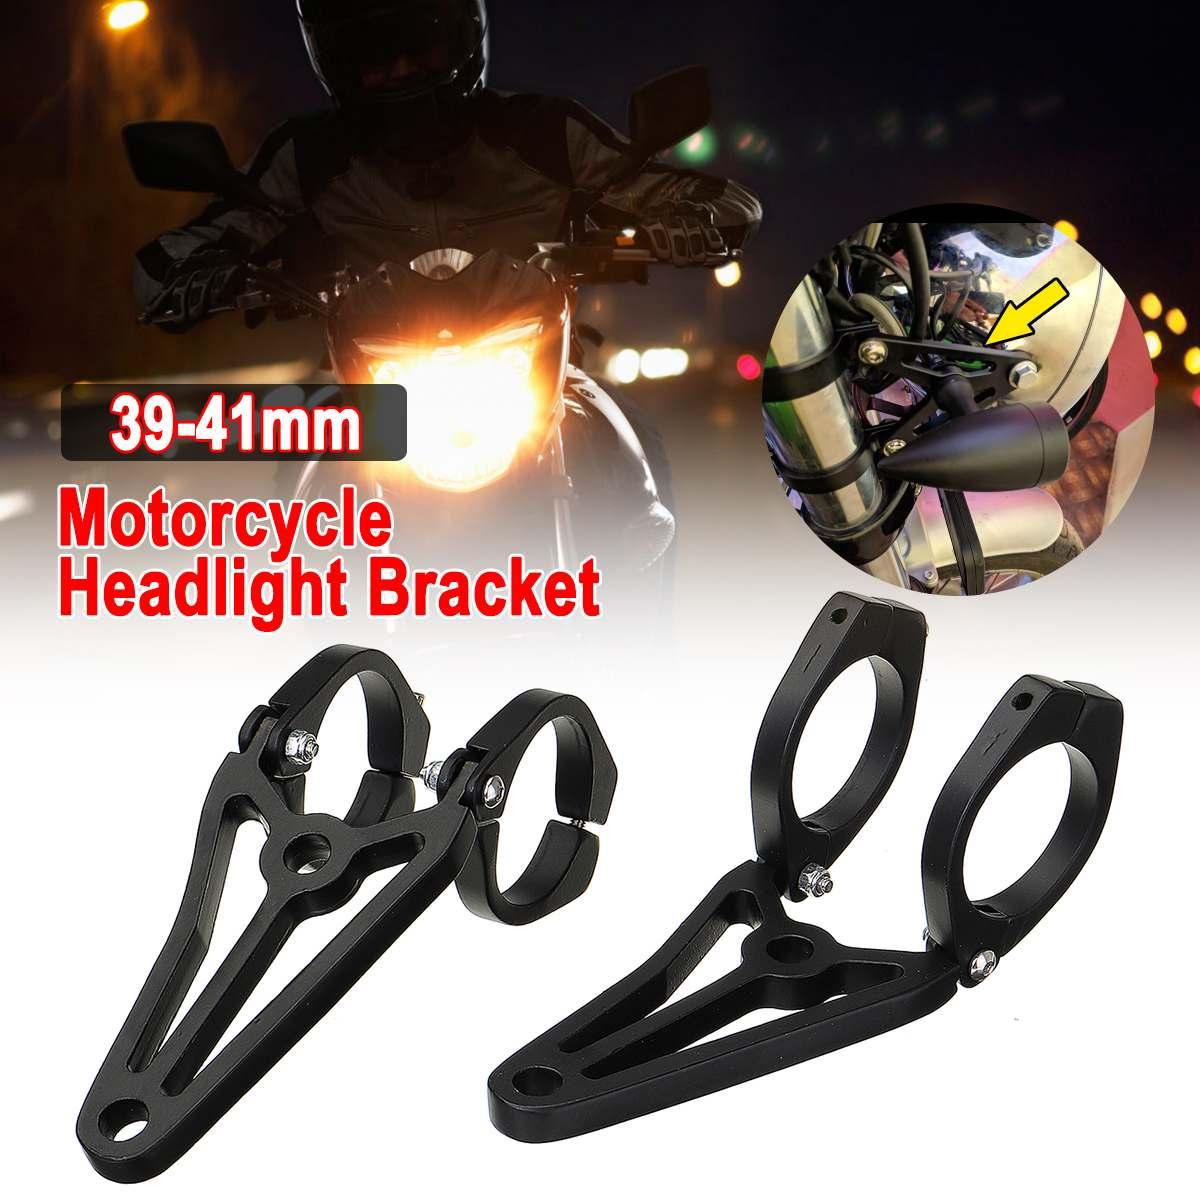 Universal-Motorcycle Headlight Head Light Mount Brackets Holder Fork39-41mm  For-Yamaha For Ducati For Suzuki For Kawasa